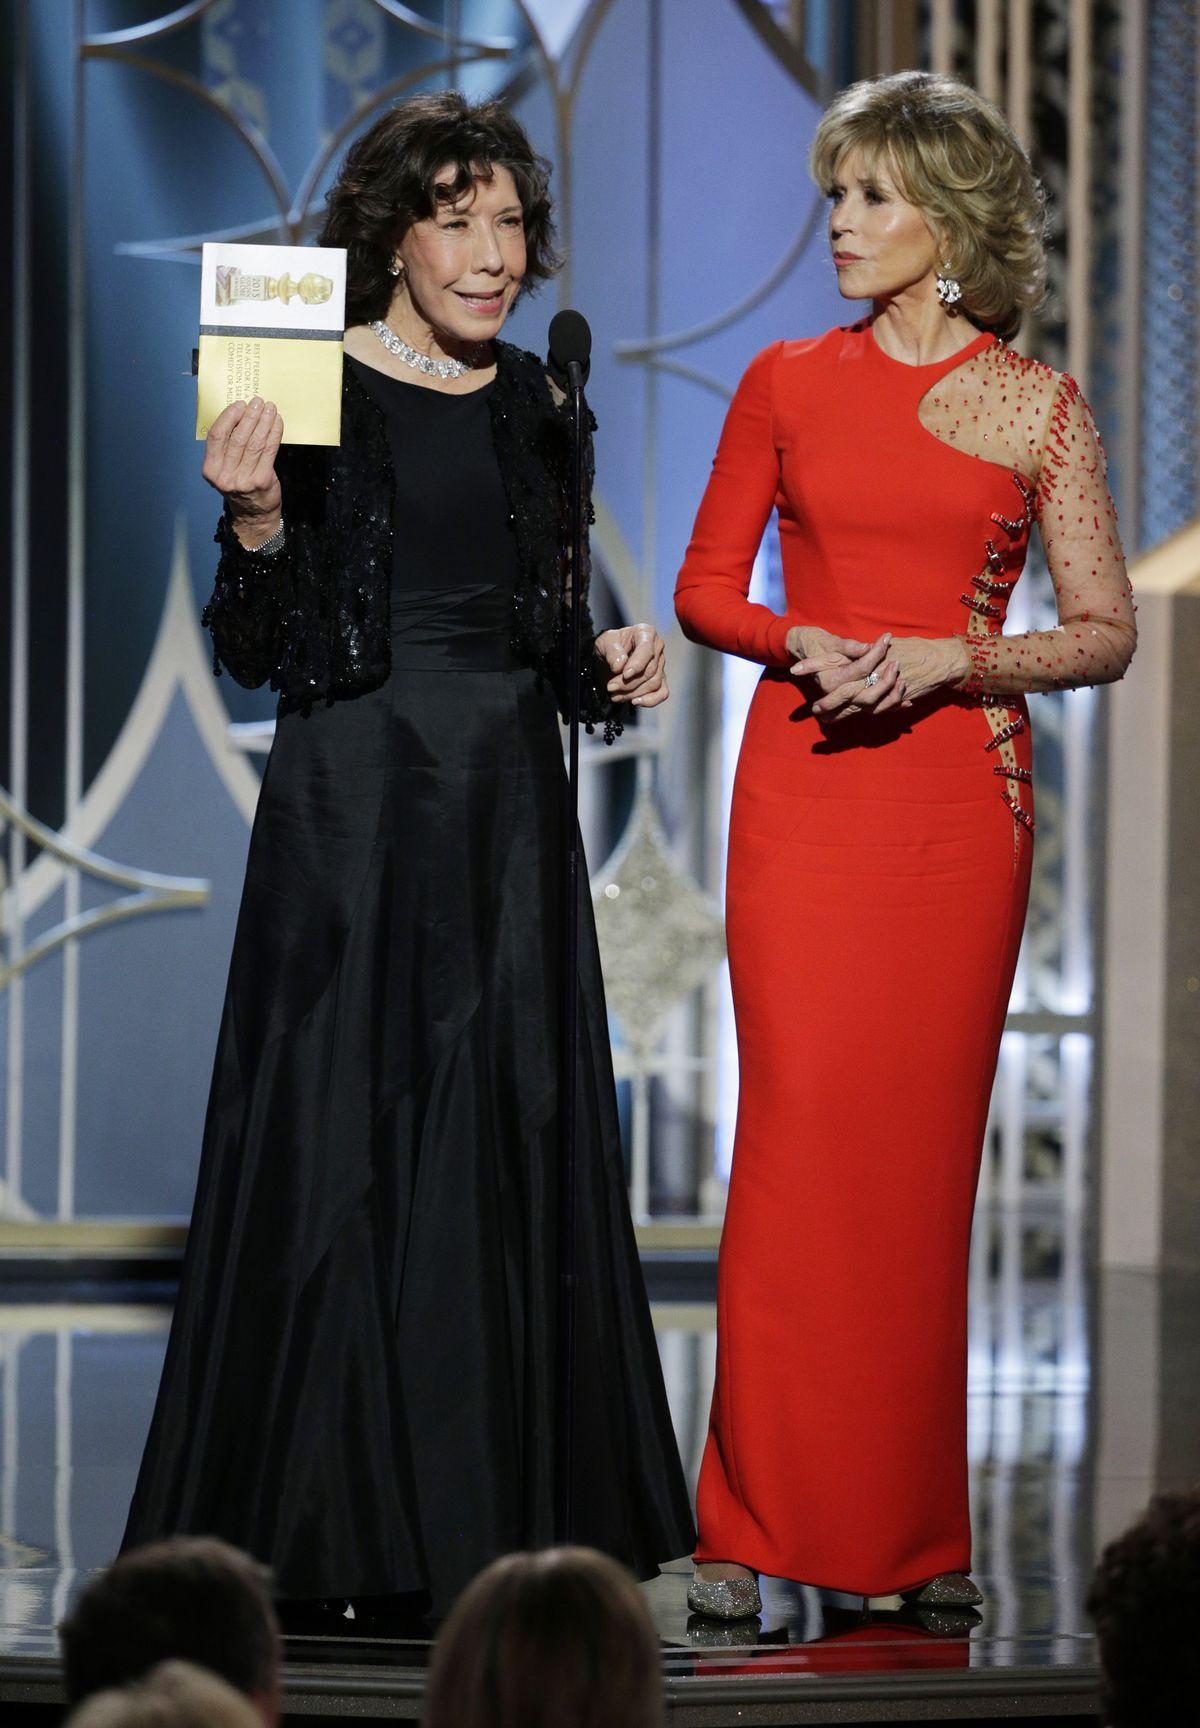 Lily Tomlin and Jane Fonda at 2015 Golden Globes